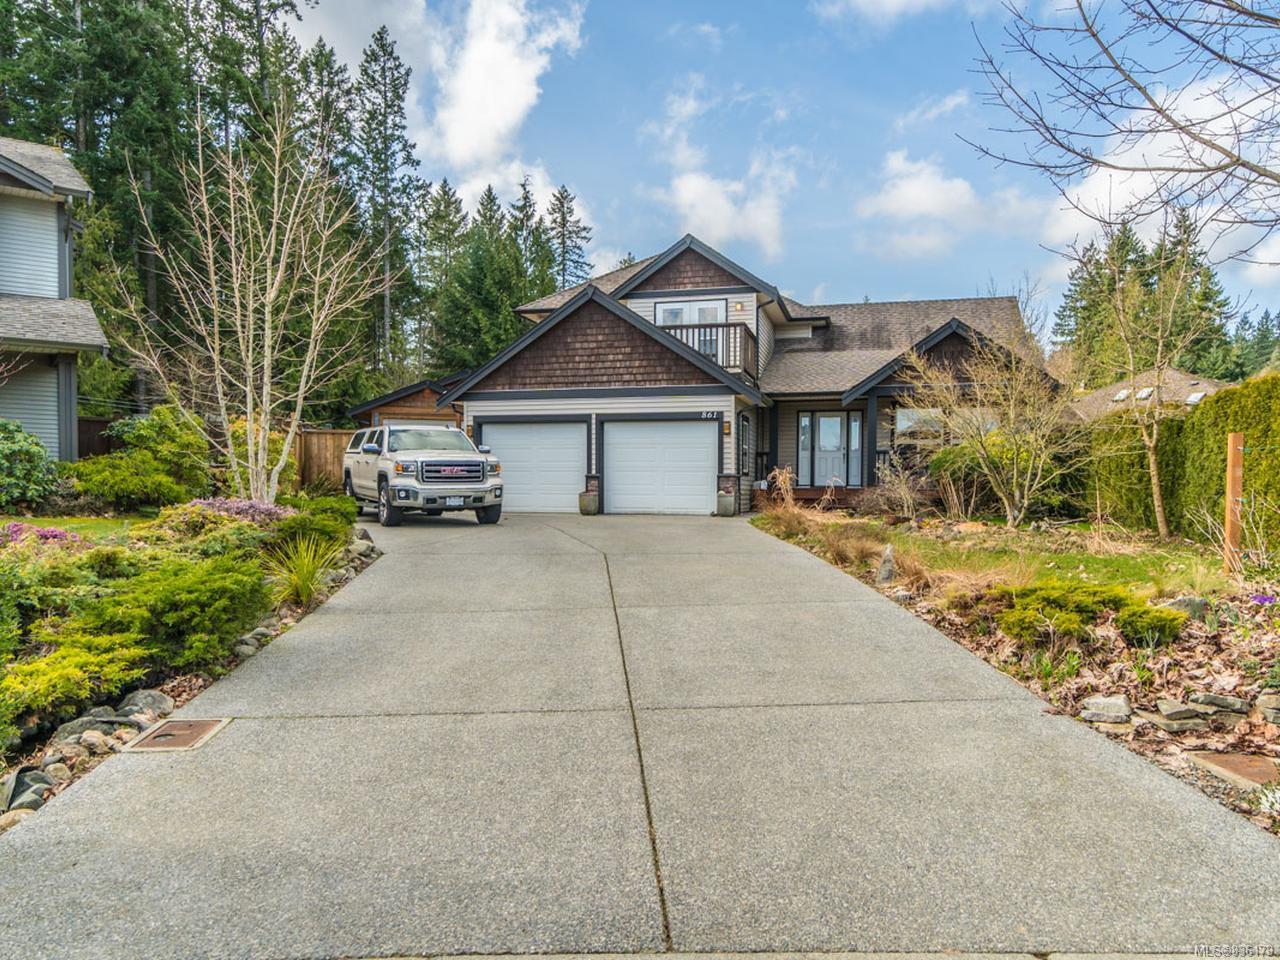 Main Photo: 861 Linwood Lane in NANAIMO: Na South Nanaimo House for sale (Nanaimo)  : MLS®# 836179